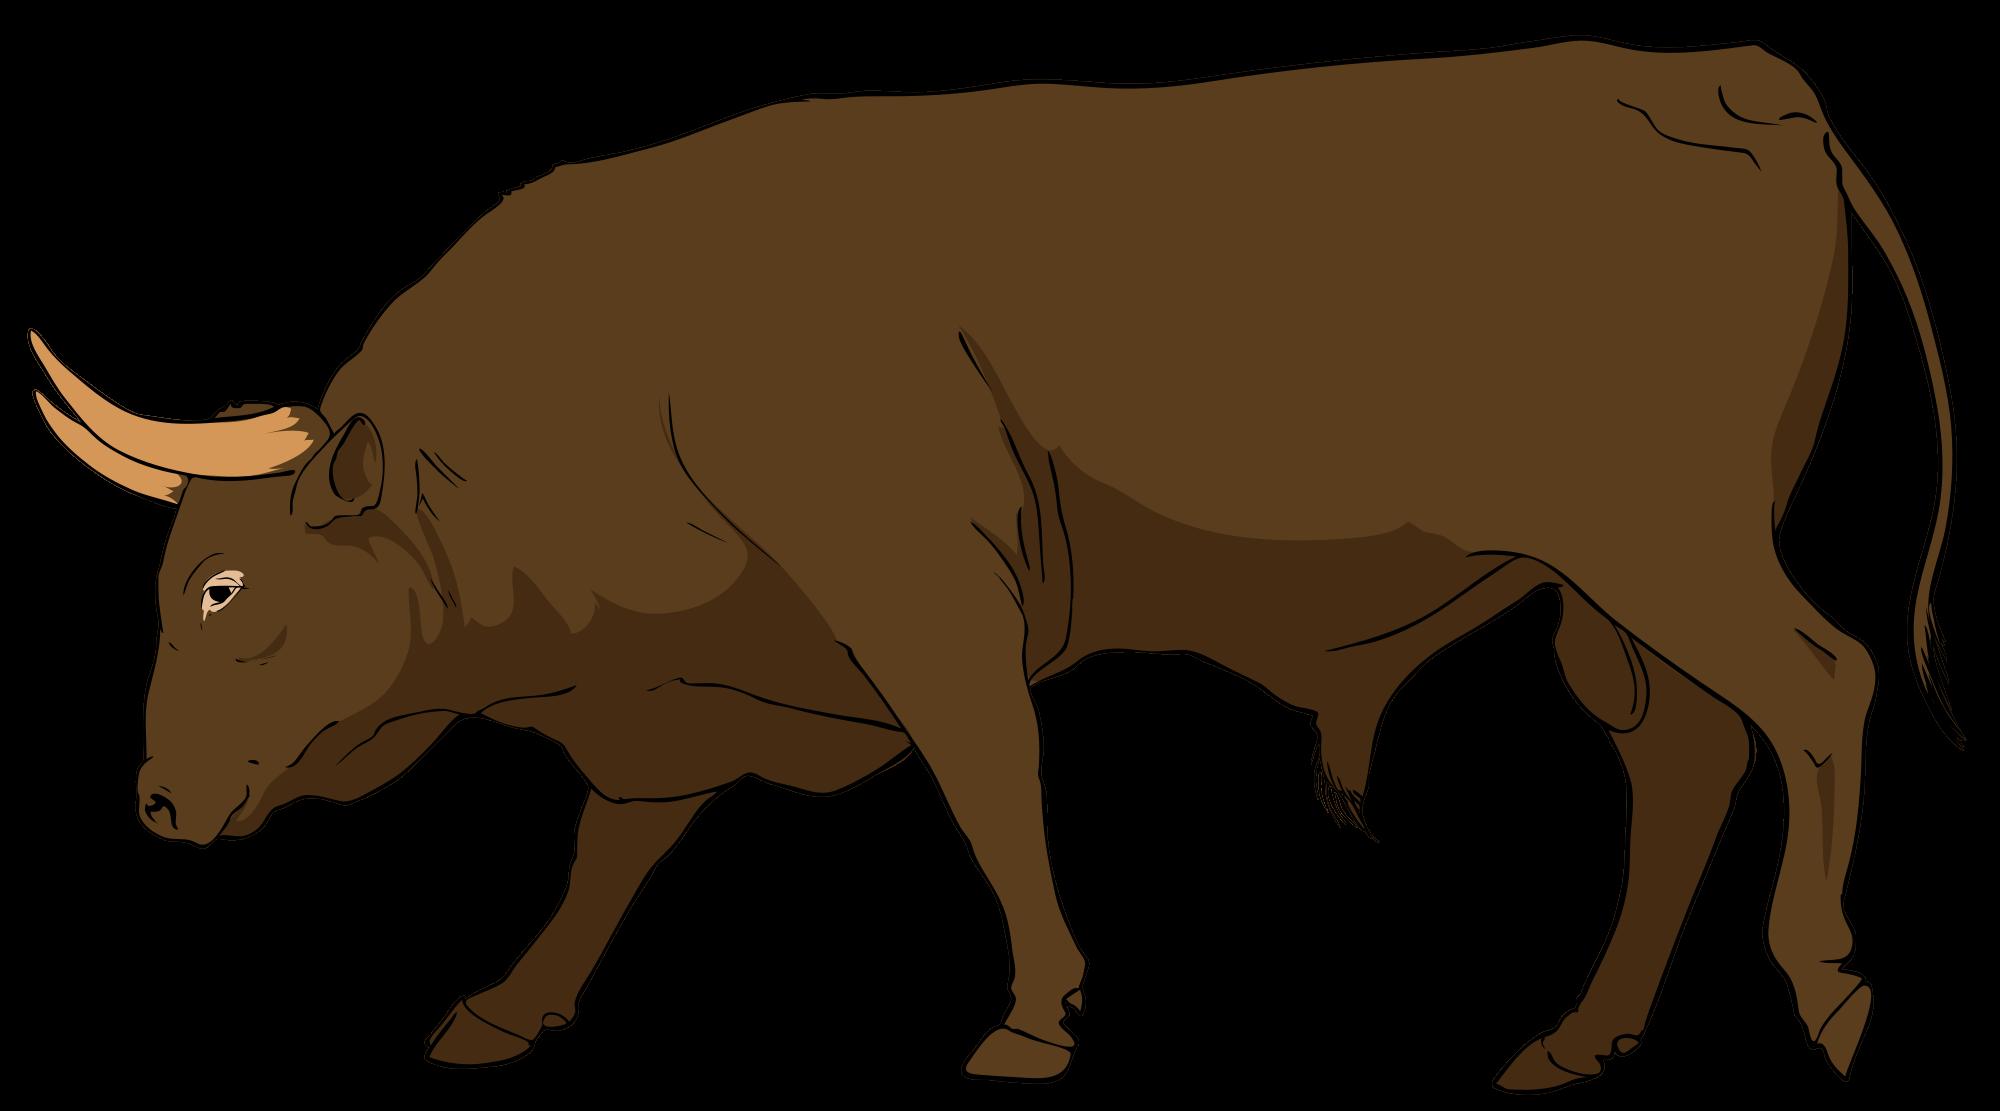 Bull clipart #7, Download drawings